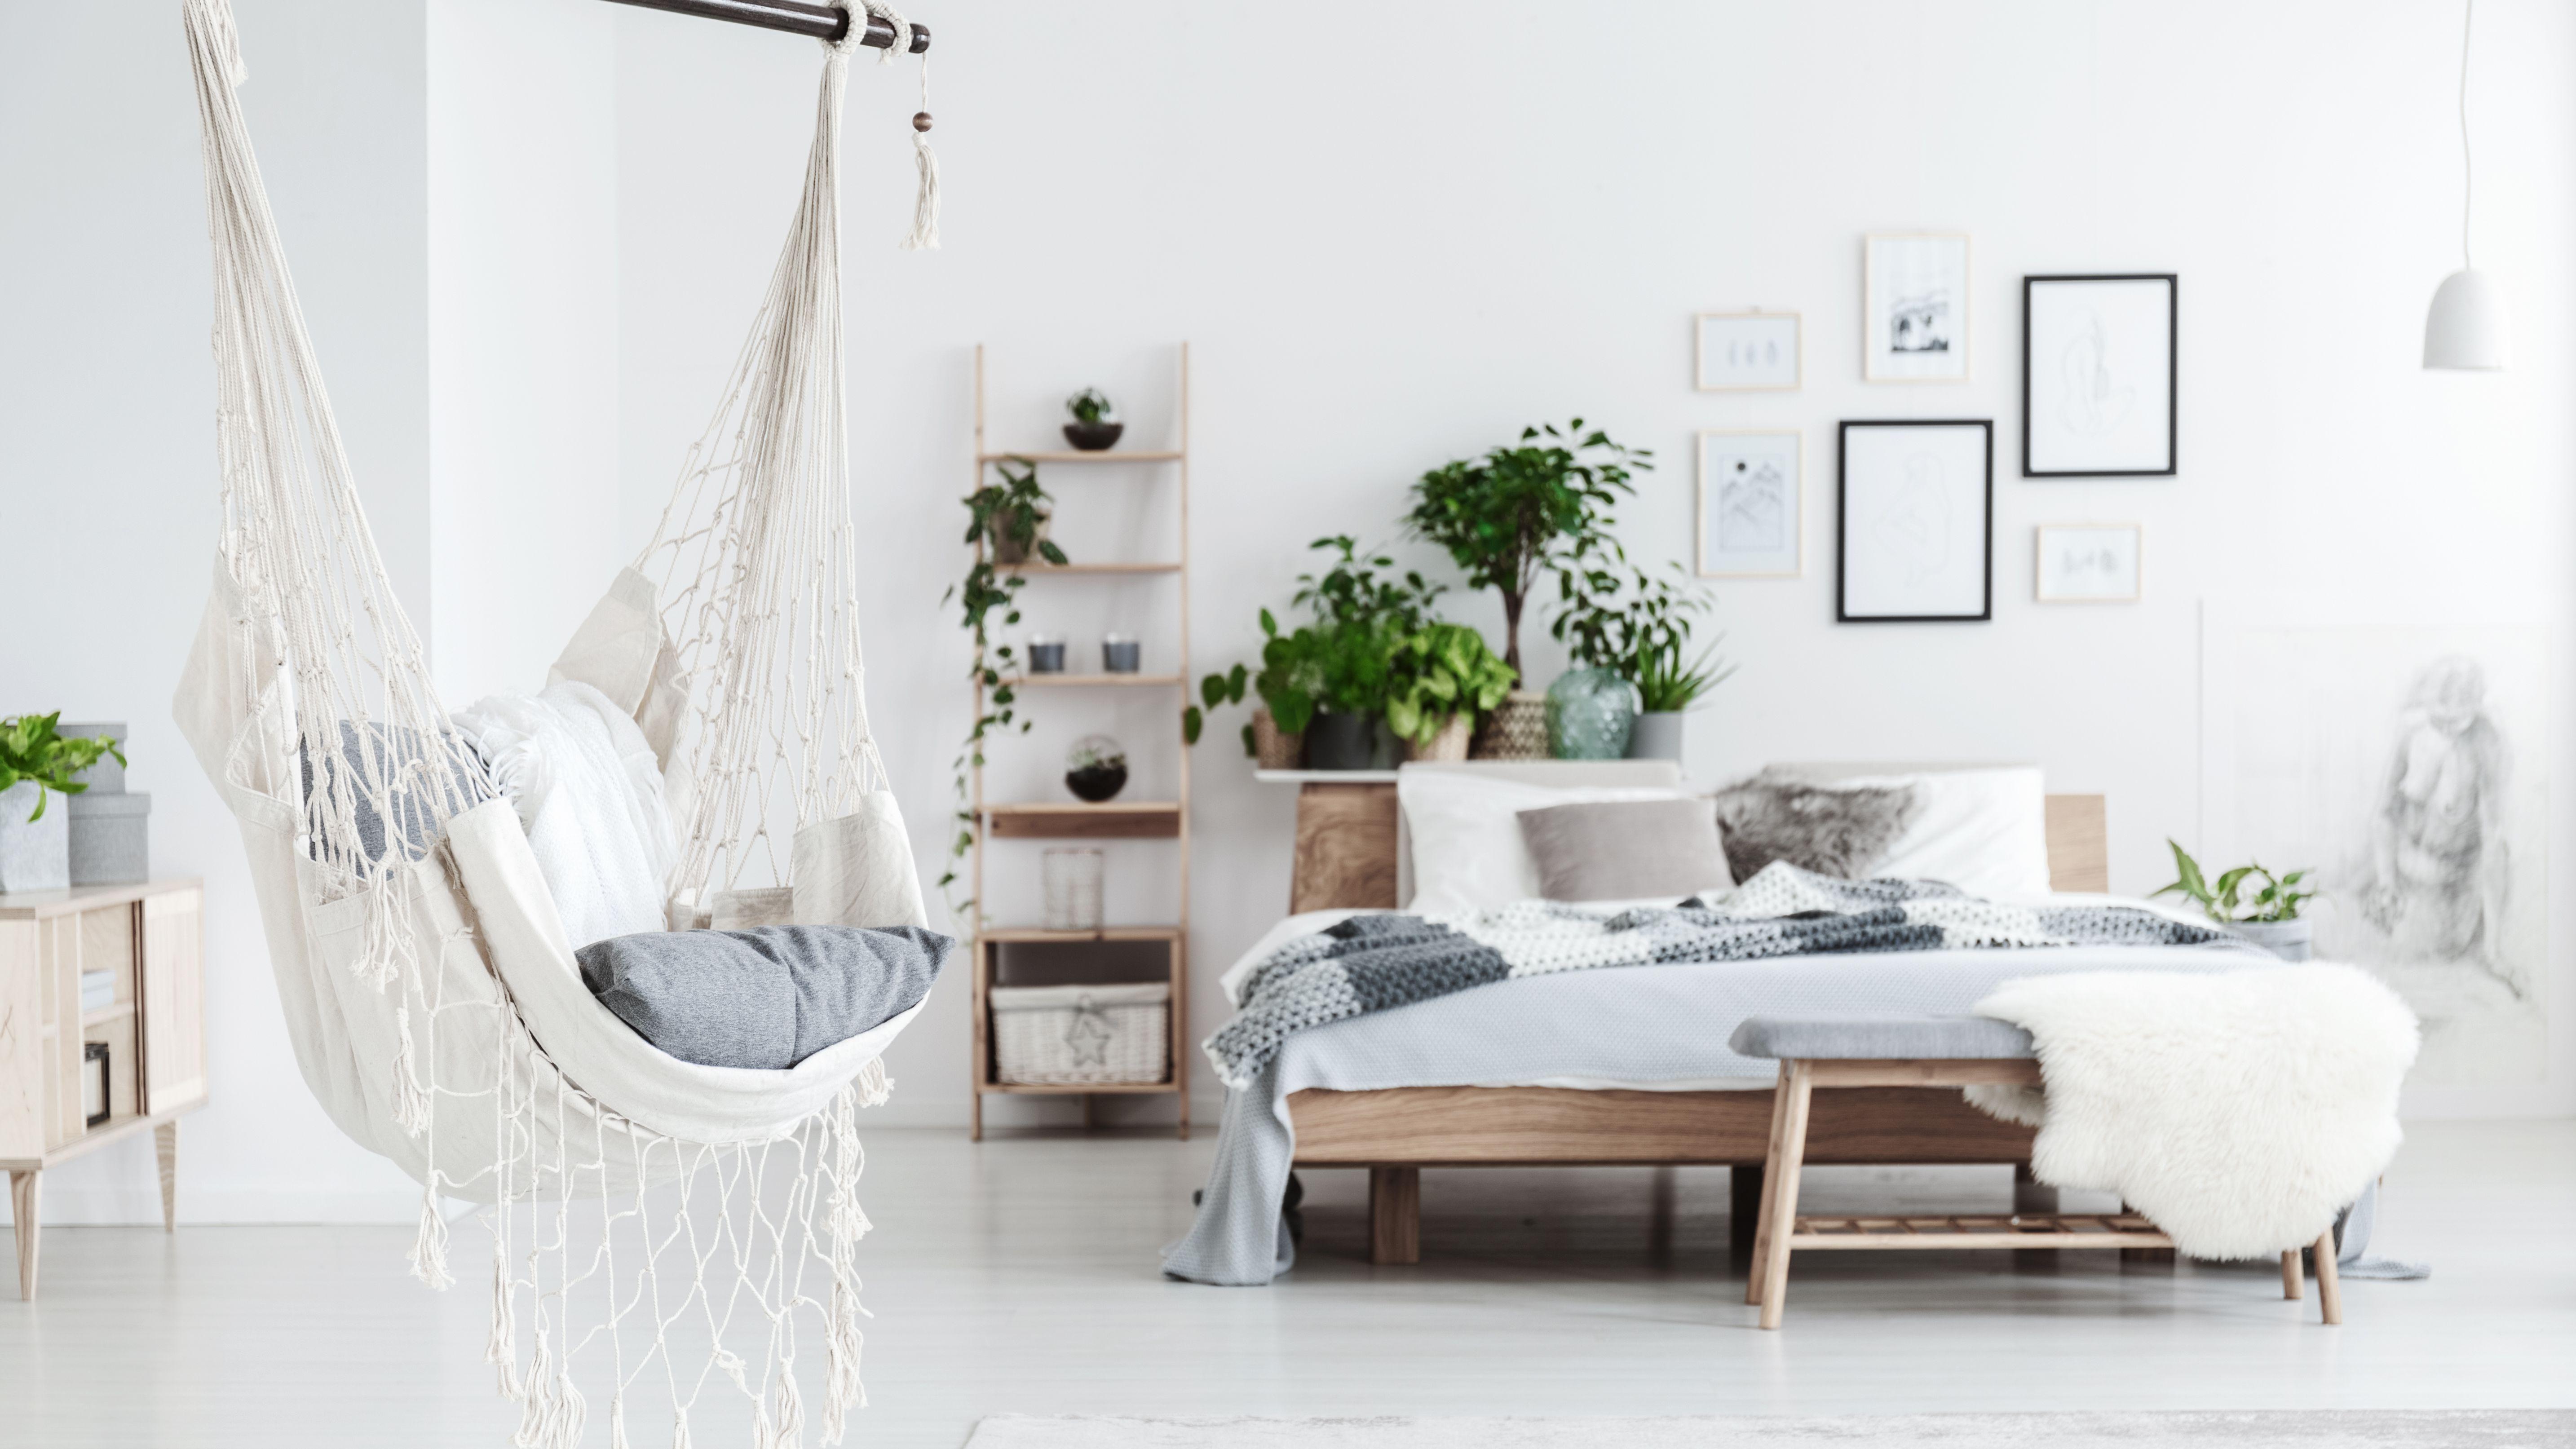 Ideas For Decorating With Indoor Hammocks, Living Room Hammock